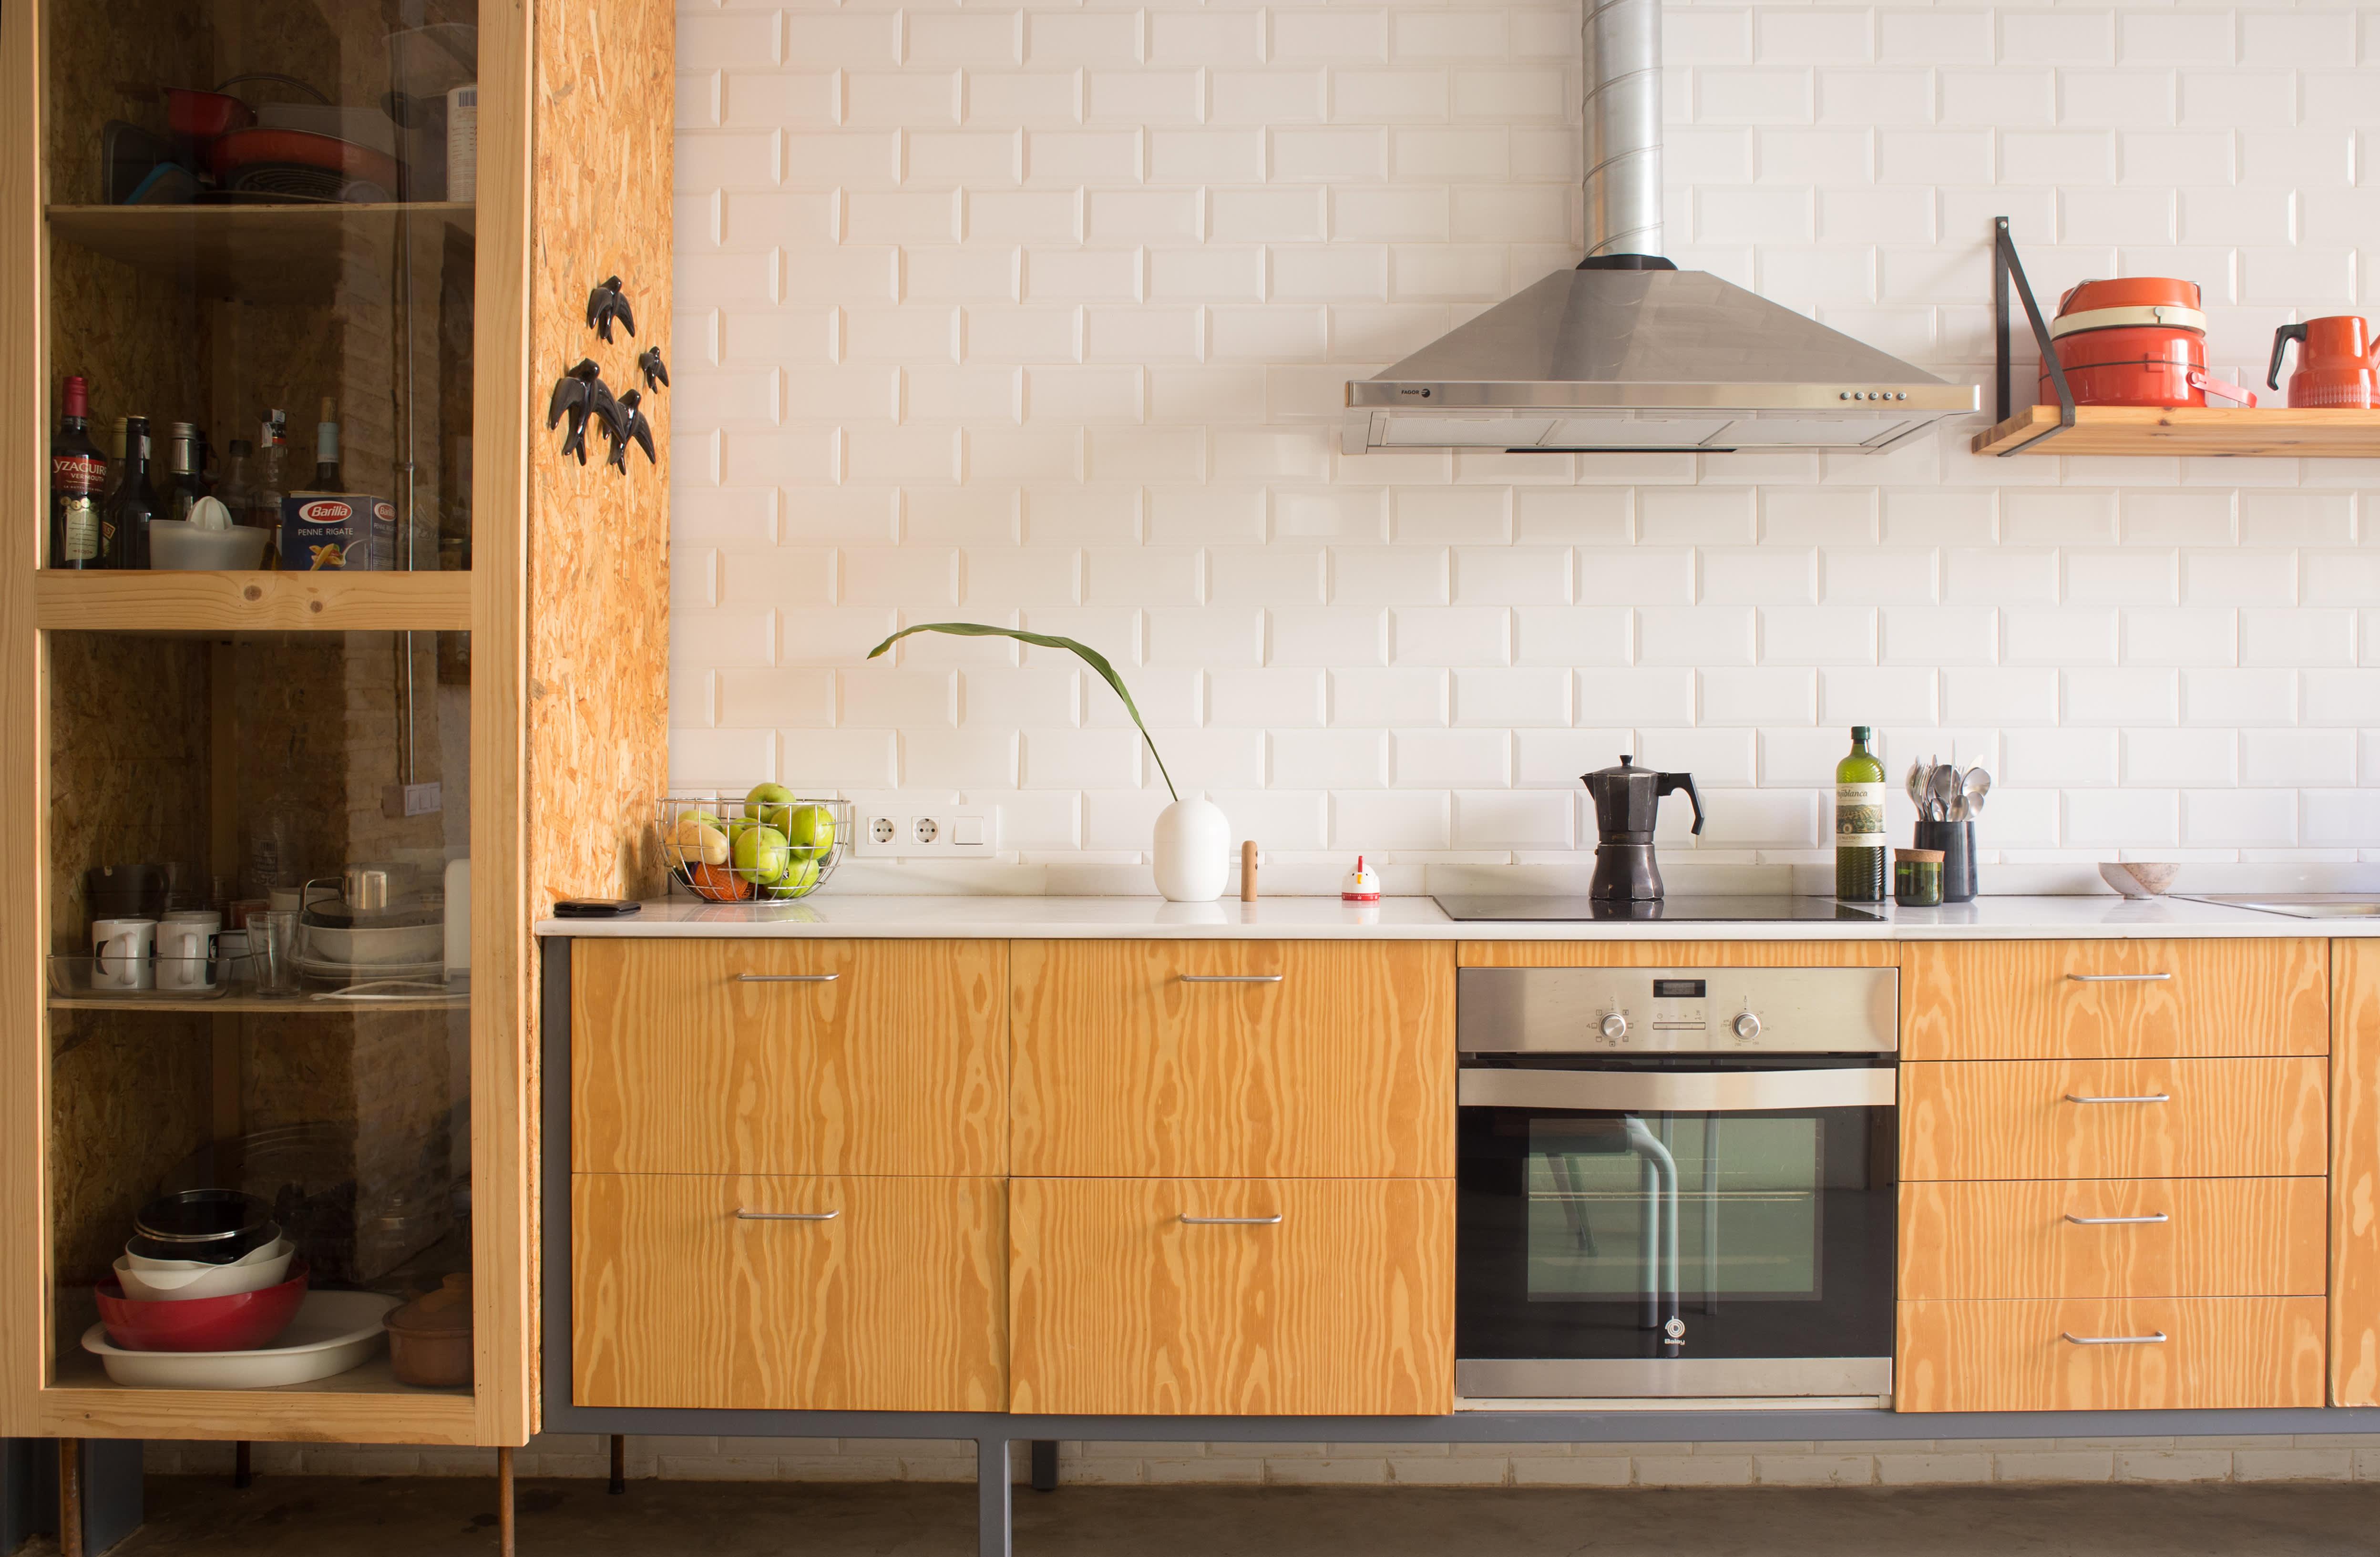 Kitchen Backsplash Tile Ideas Pictures Designs